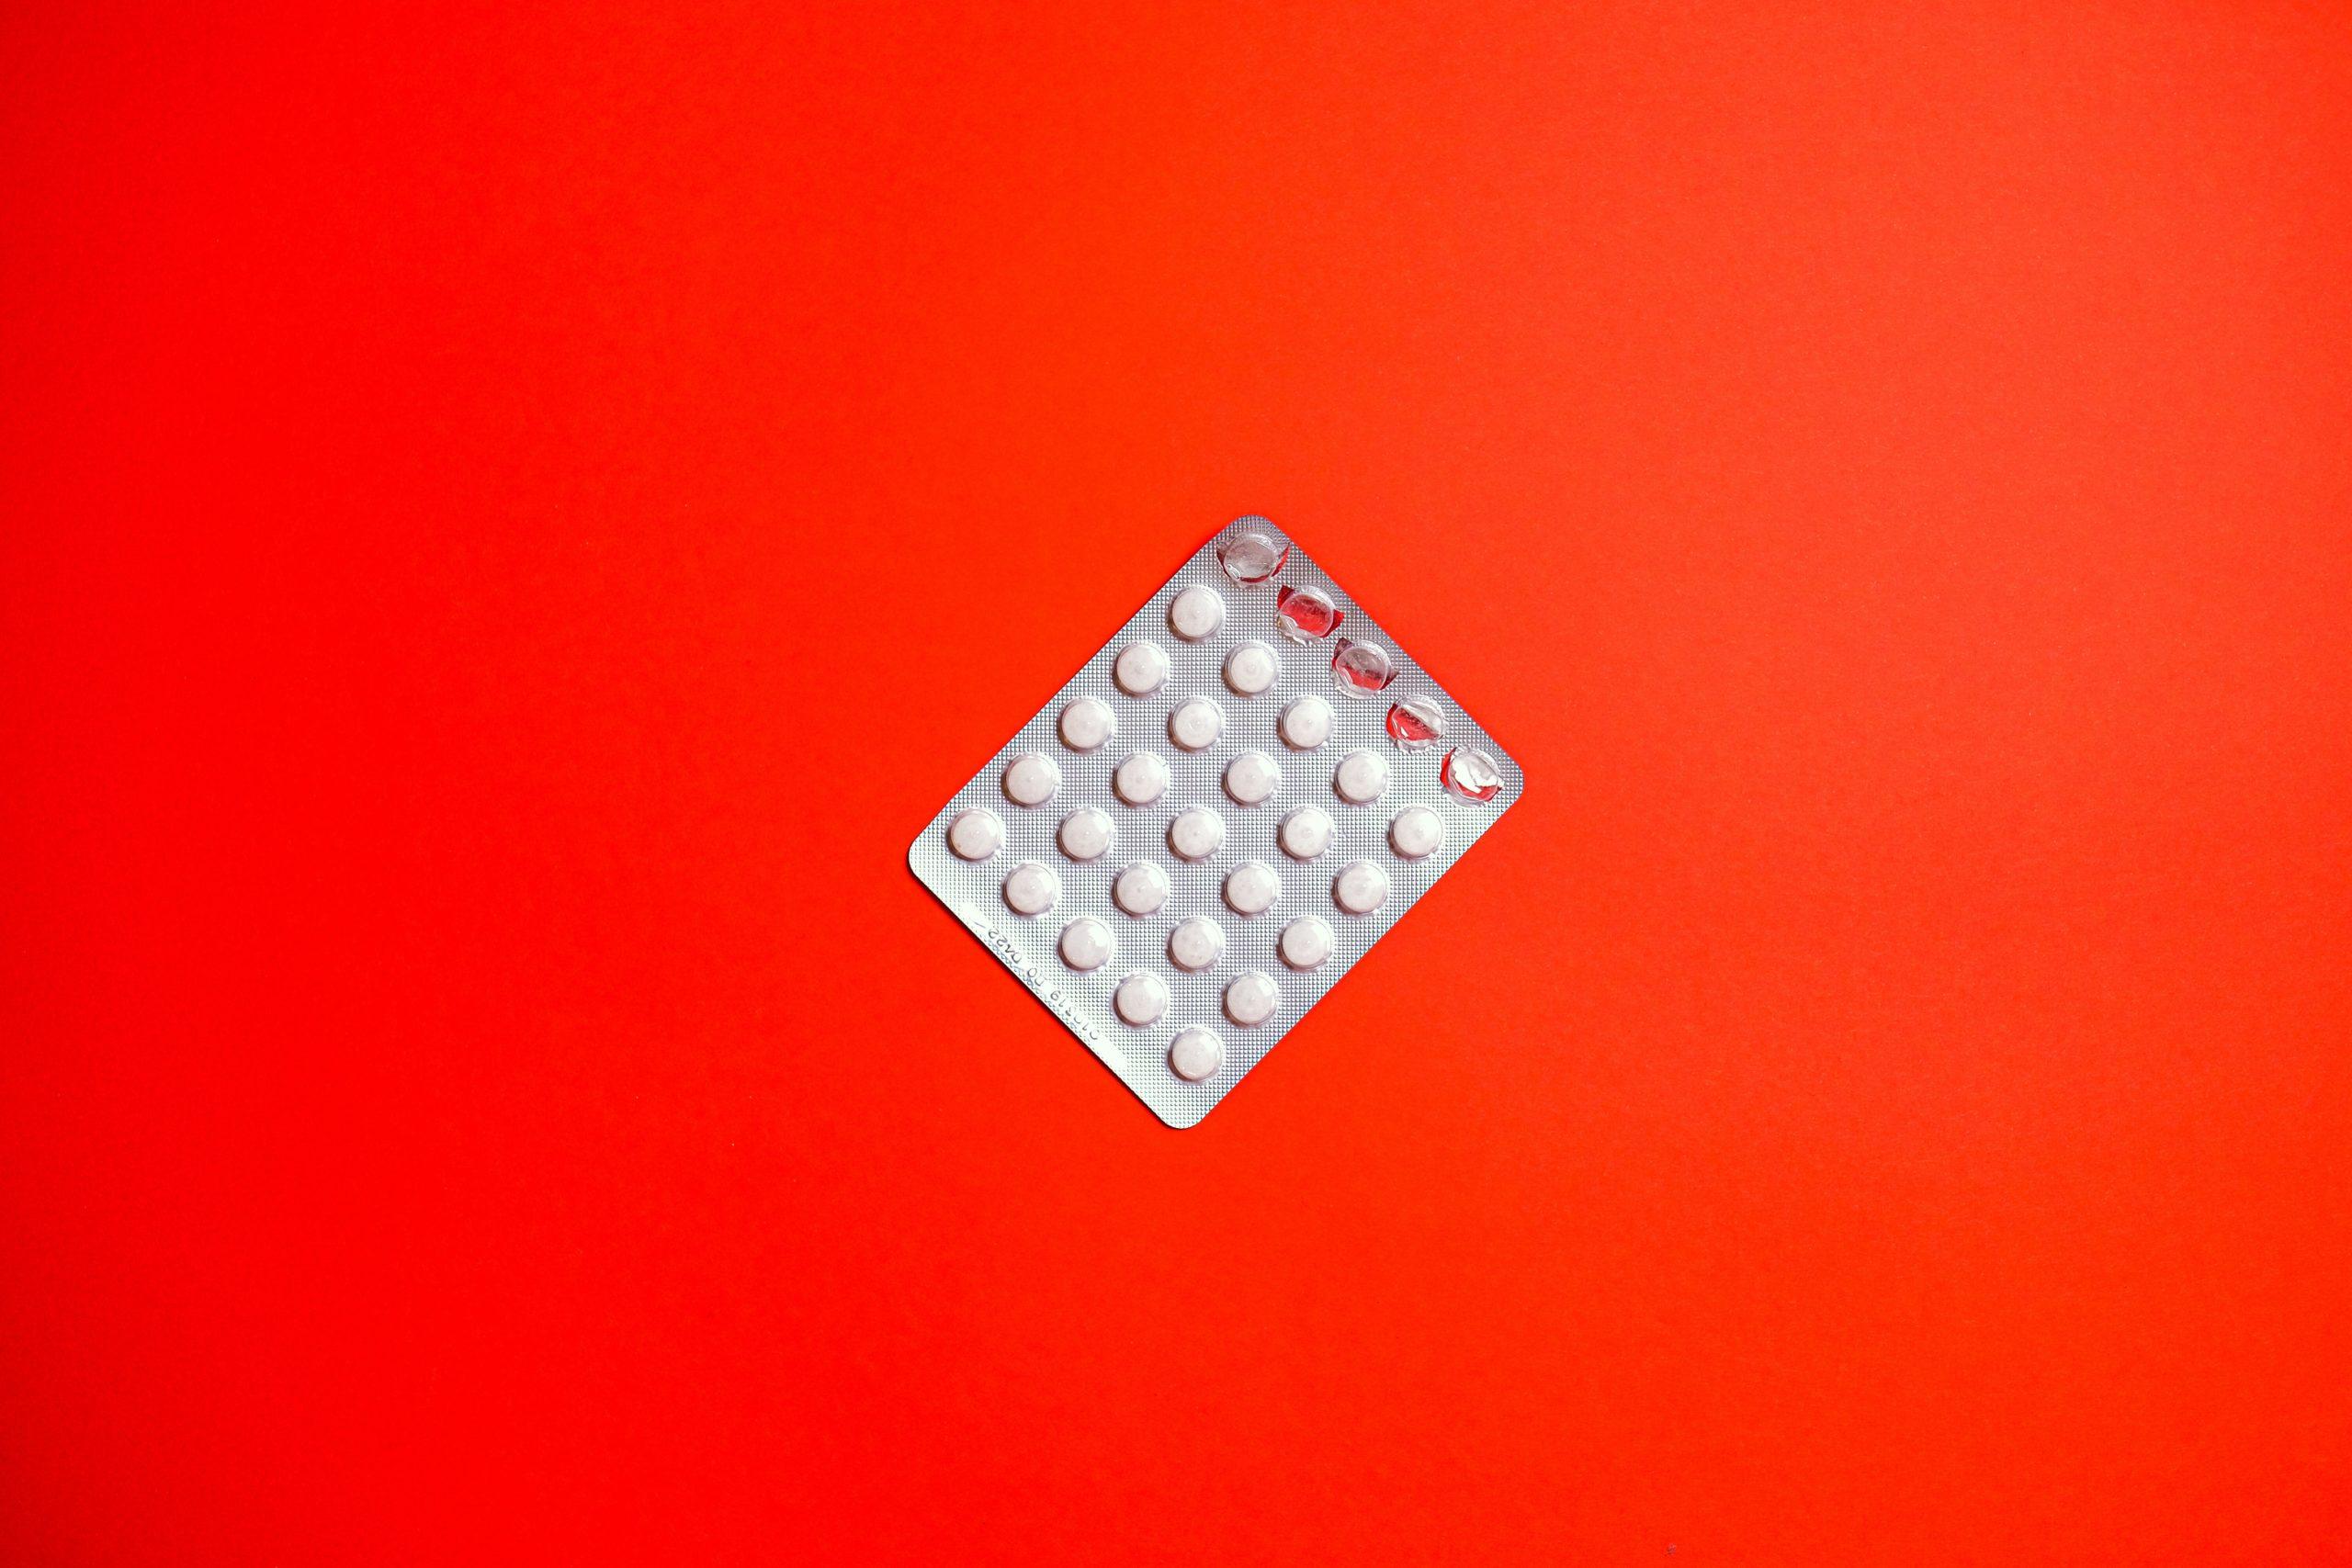 leki na e-receptę